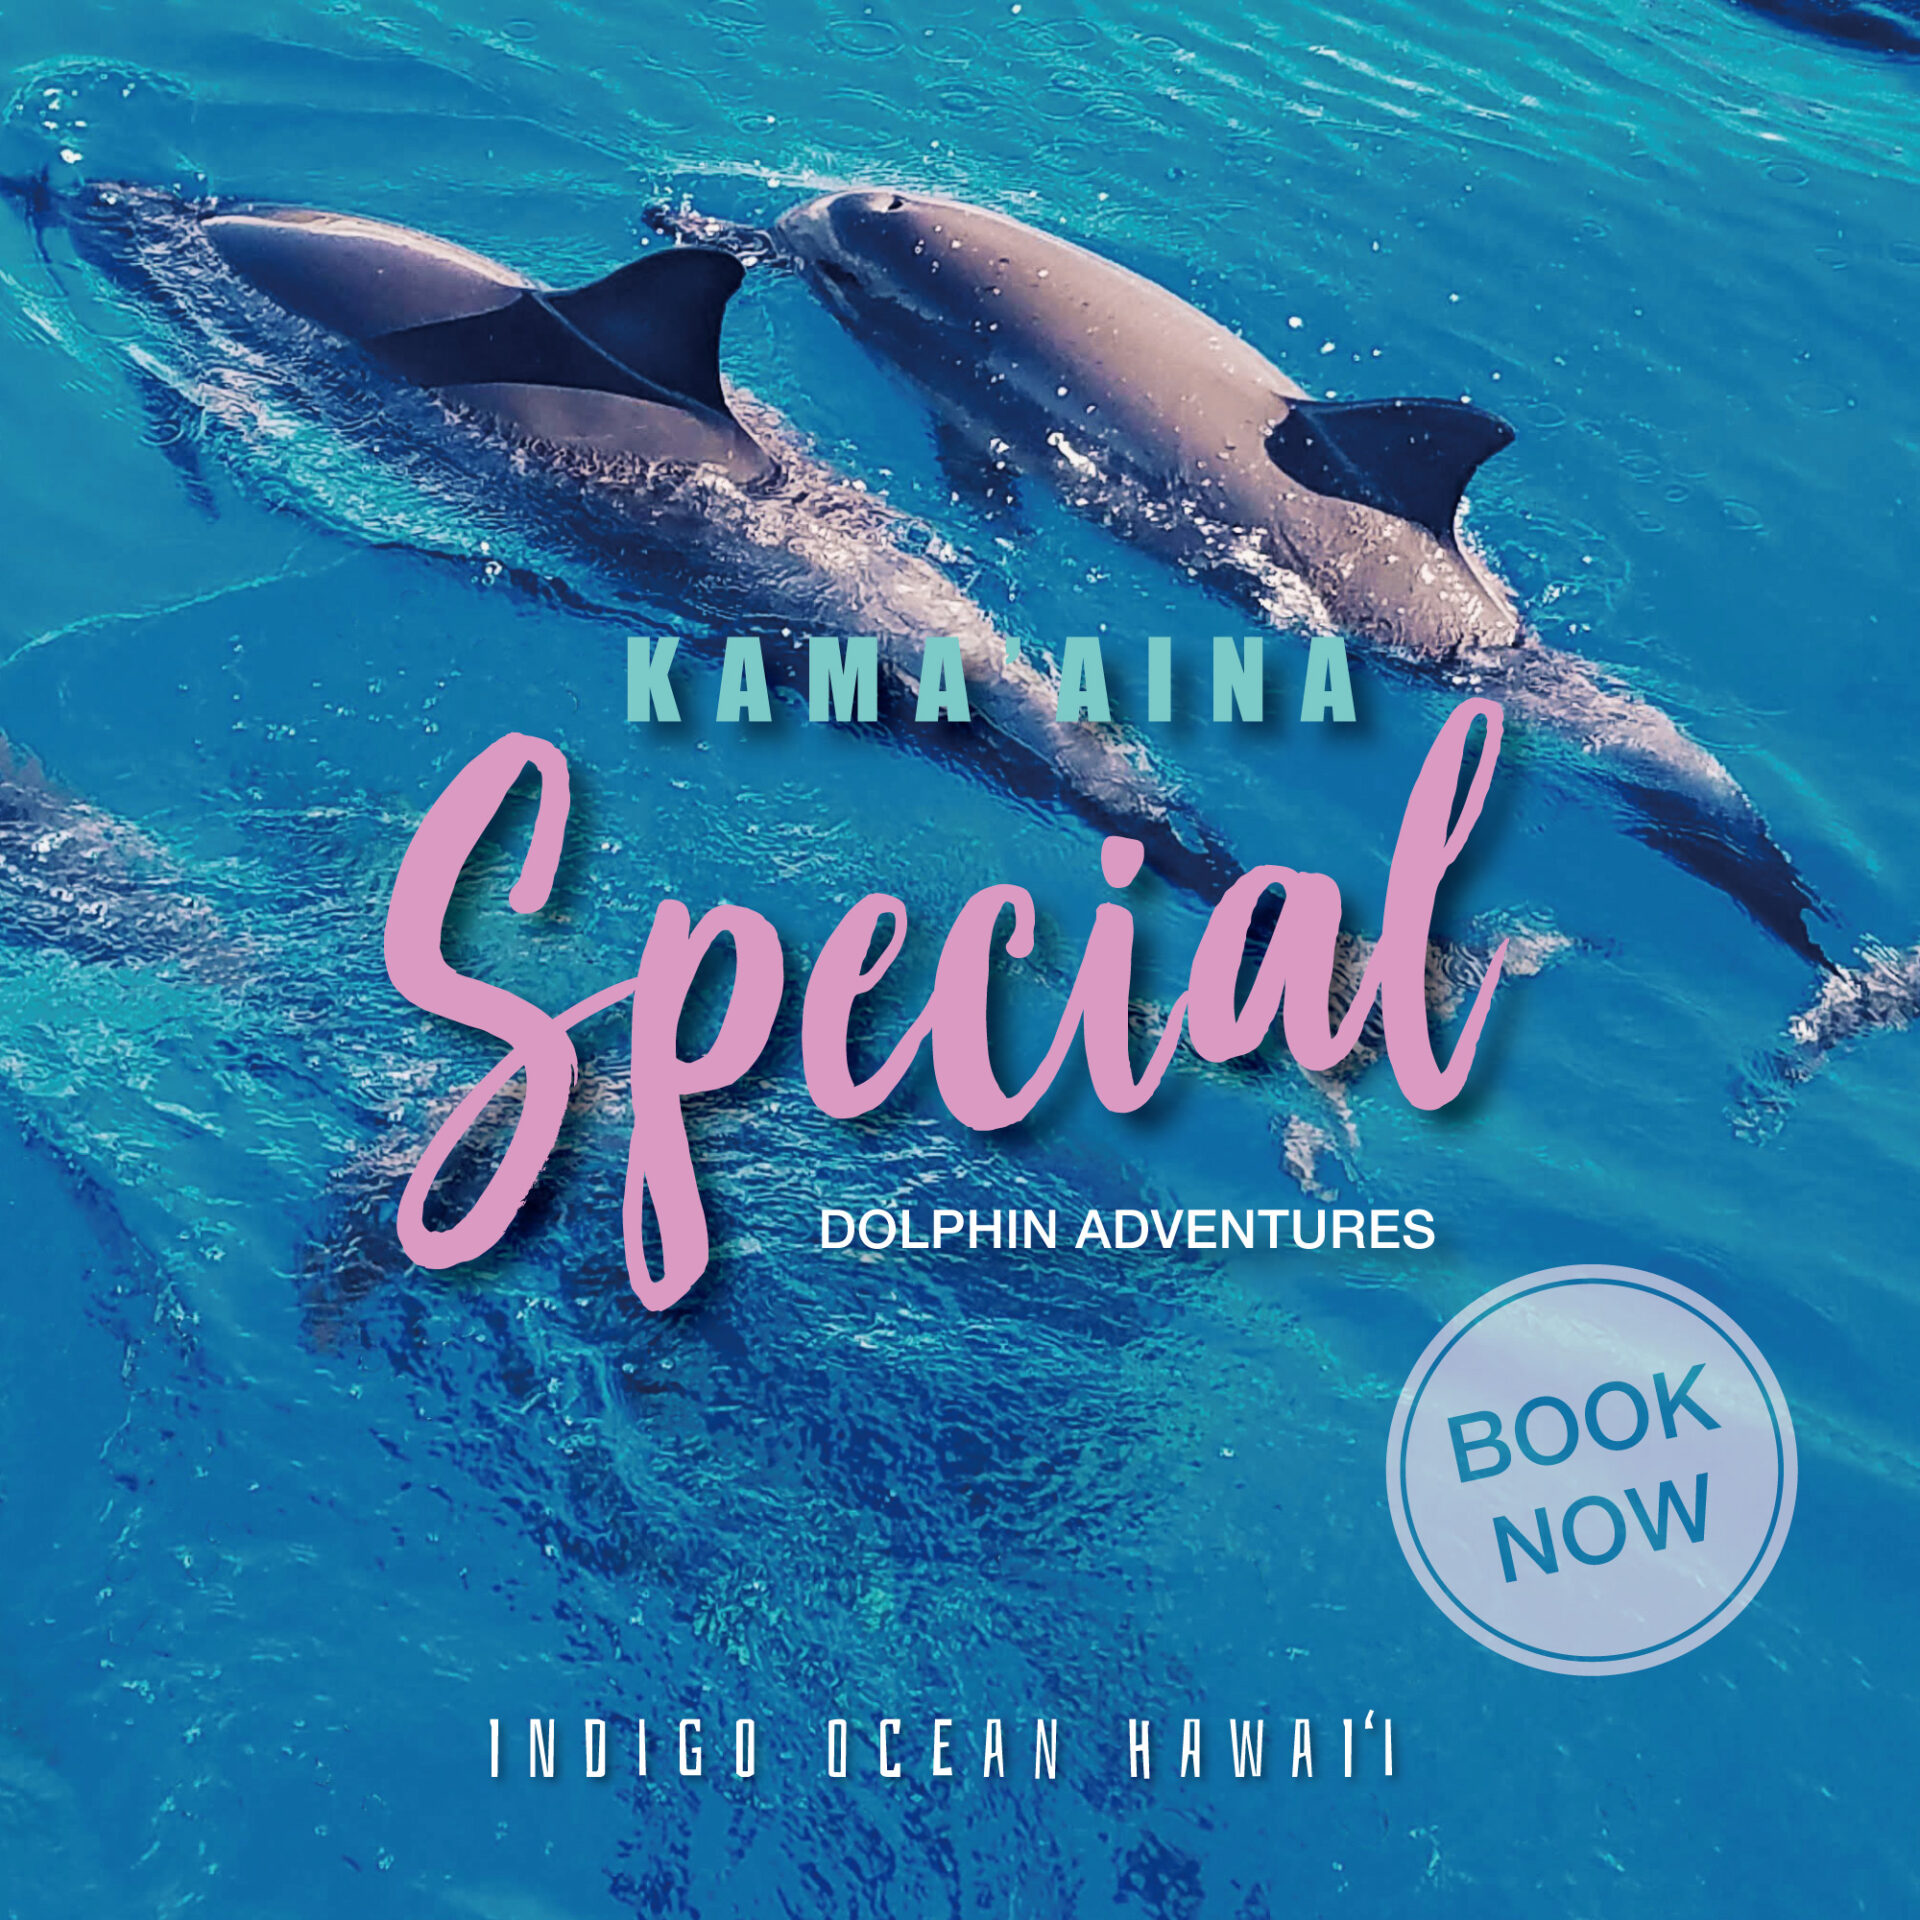 Kama'aina Special